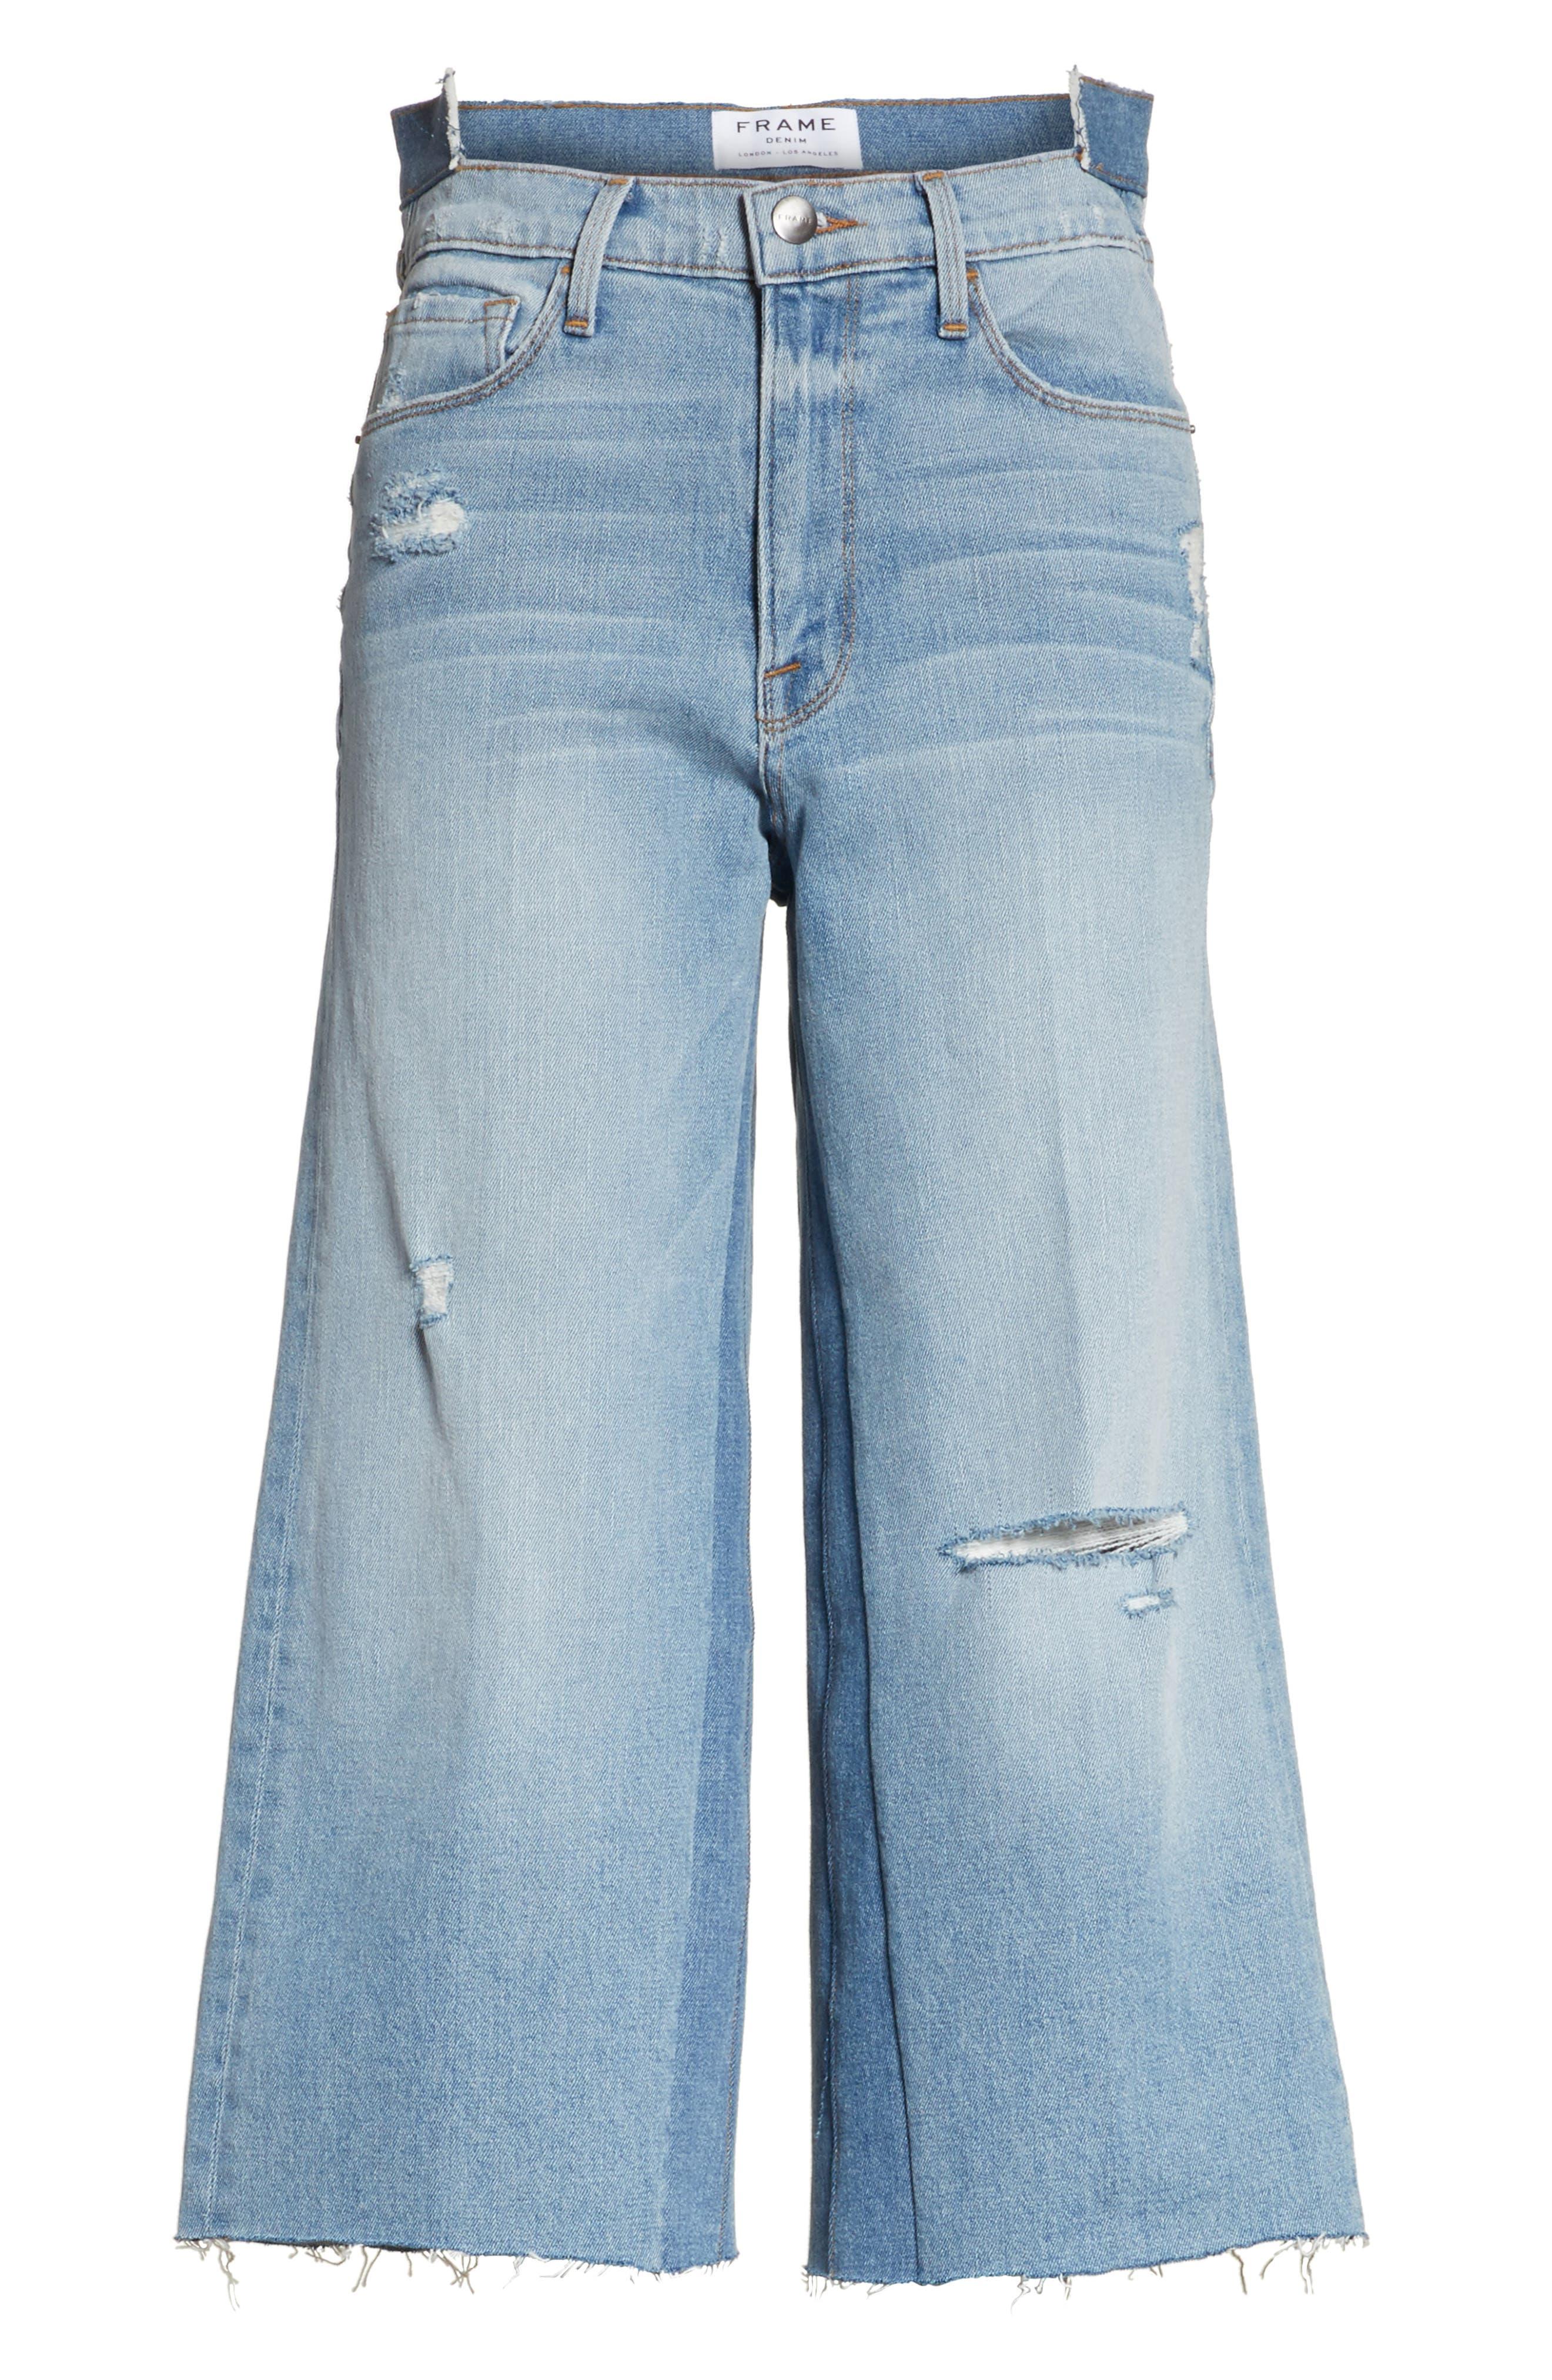 Le Reconstructed High Waist Crop Wide Leg Jeans,                             Alternate thumbnail 6, color,                             451